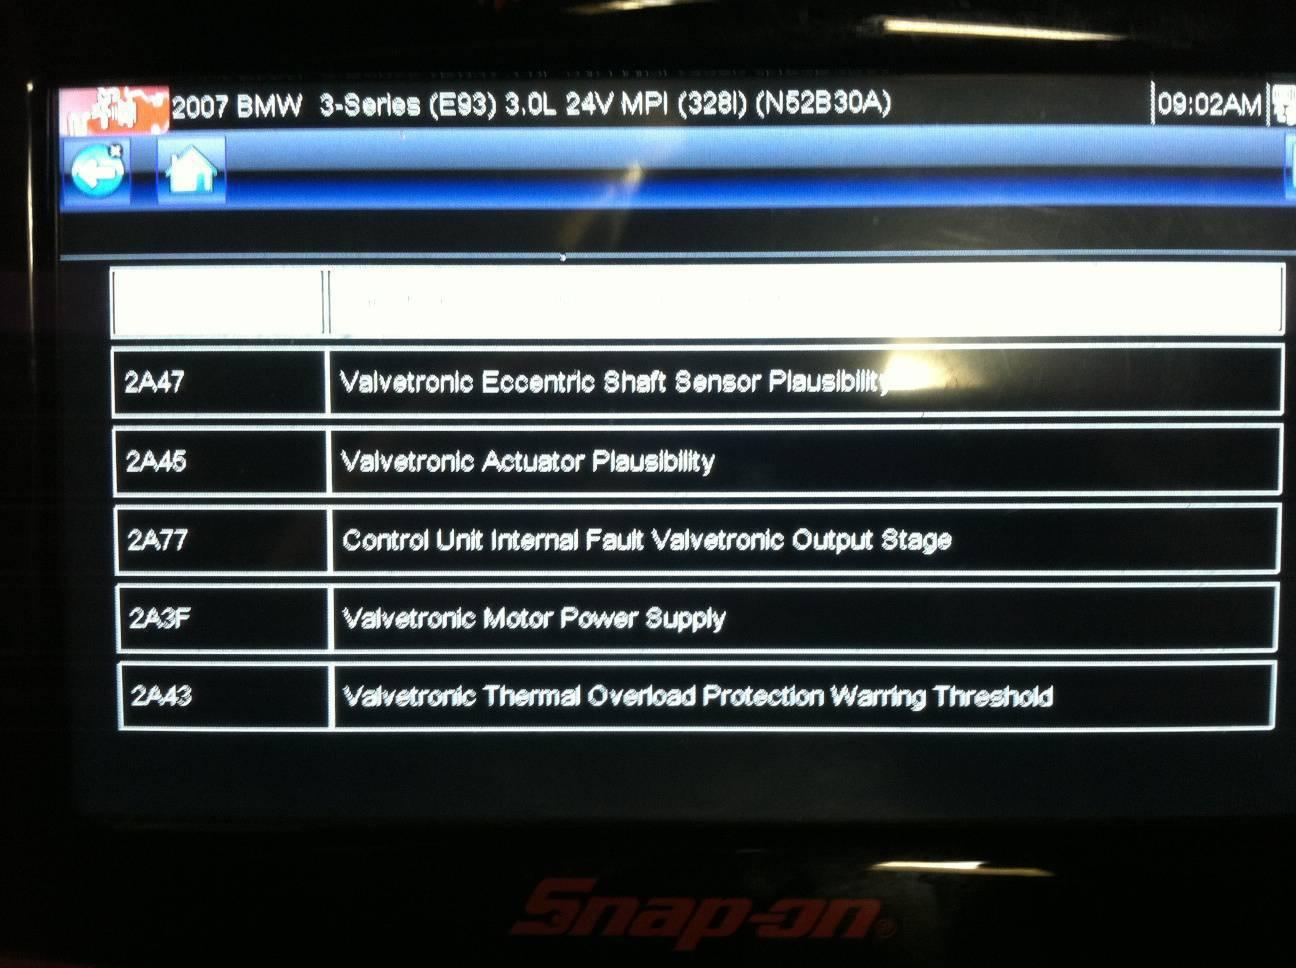 Eccentric Shaft Sensor Or Valvetronic Motor Failure